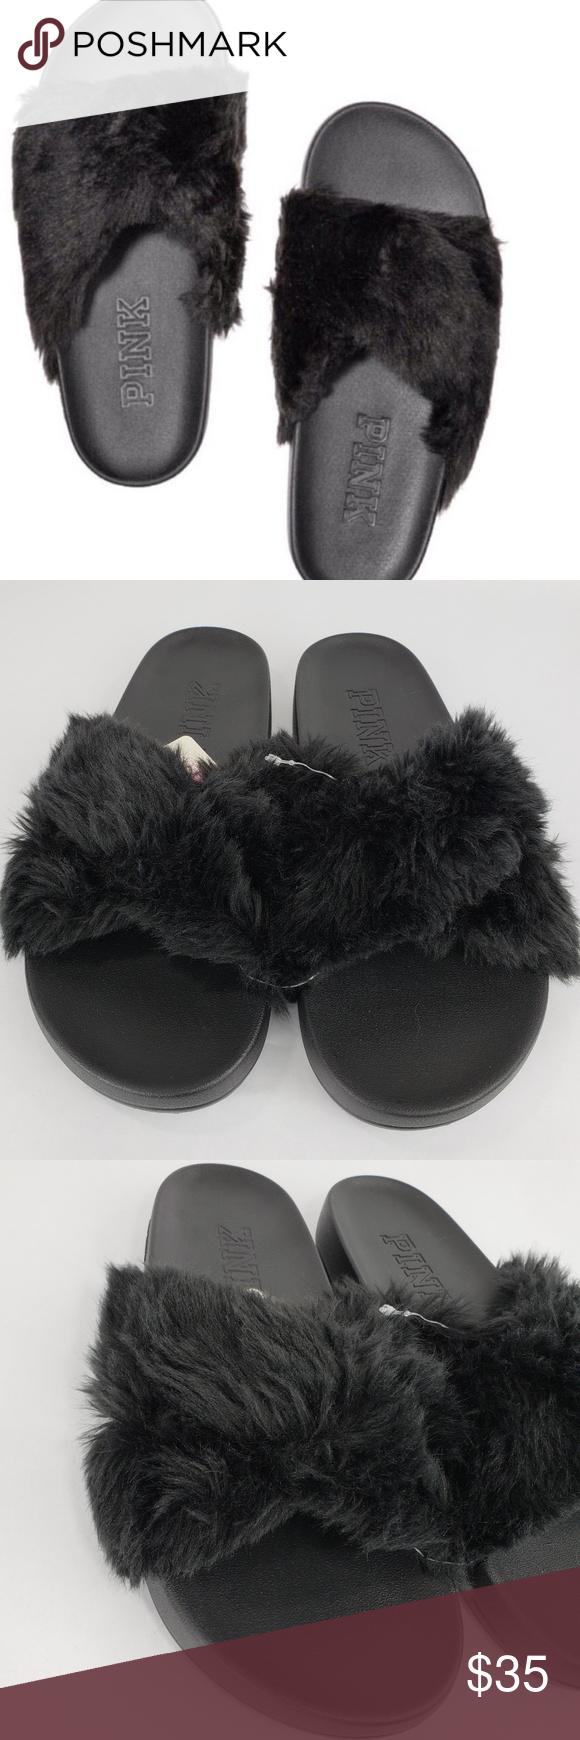 5752e8feb7af5 VS PINK Black Faux Fur Criss Cross Slides NWT Victoria's Secret PINK ...